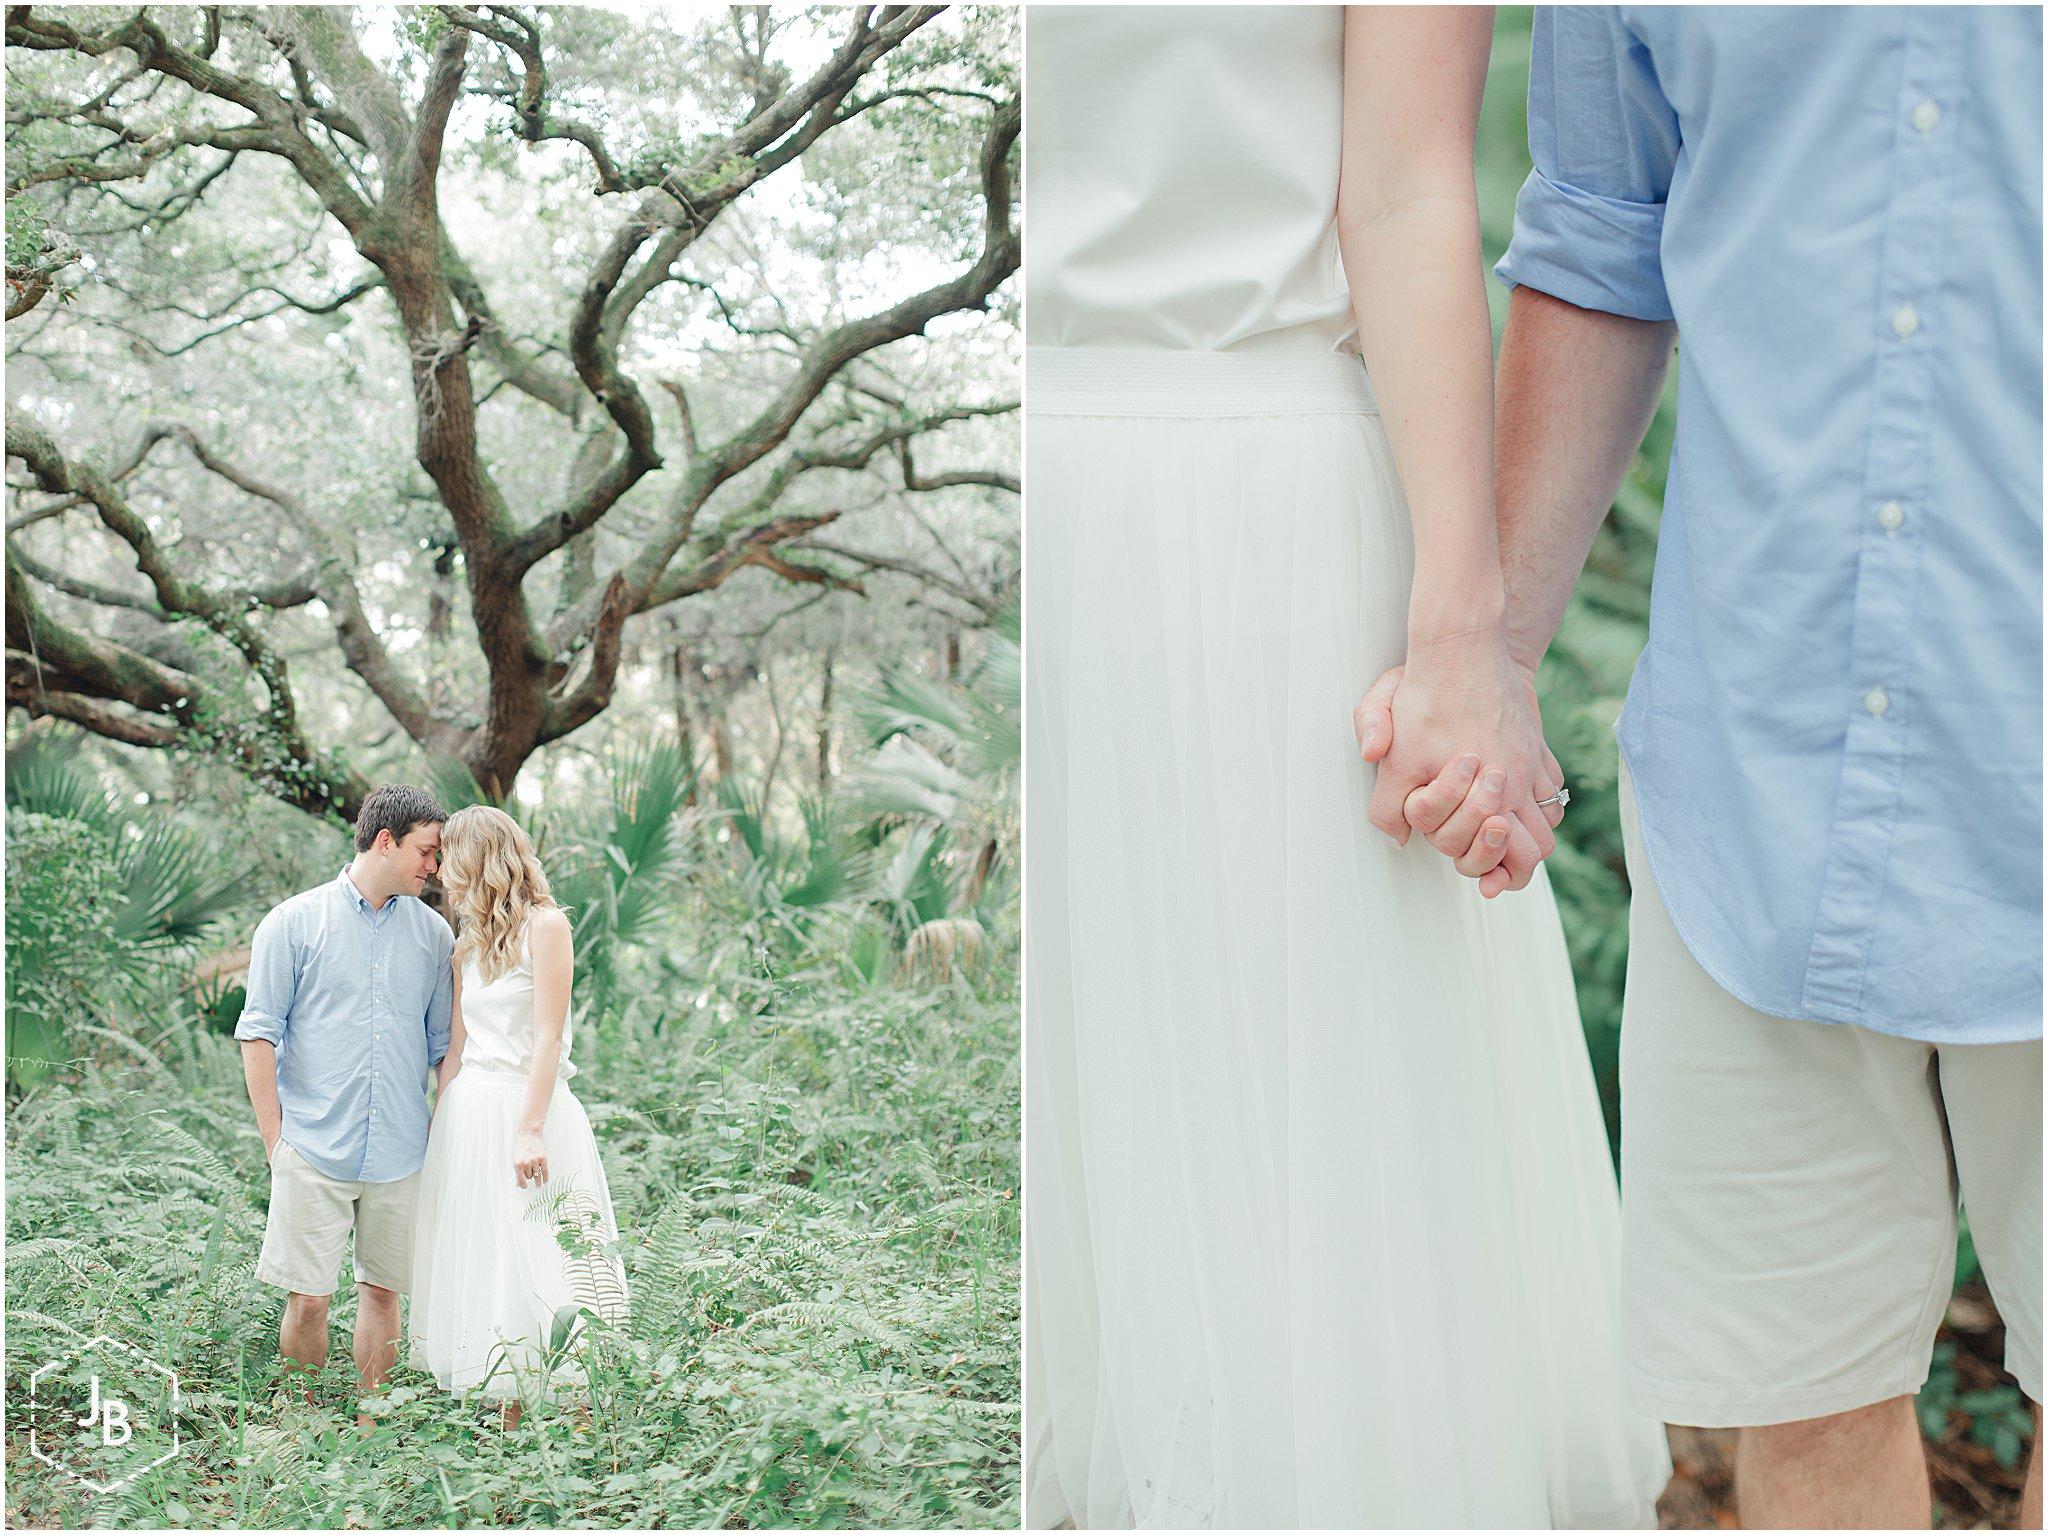 WeddingandEngagementFloridaPhotographer_0033.jpg